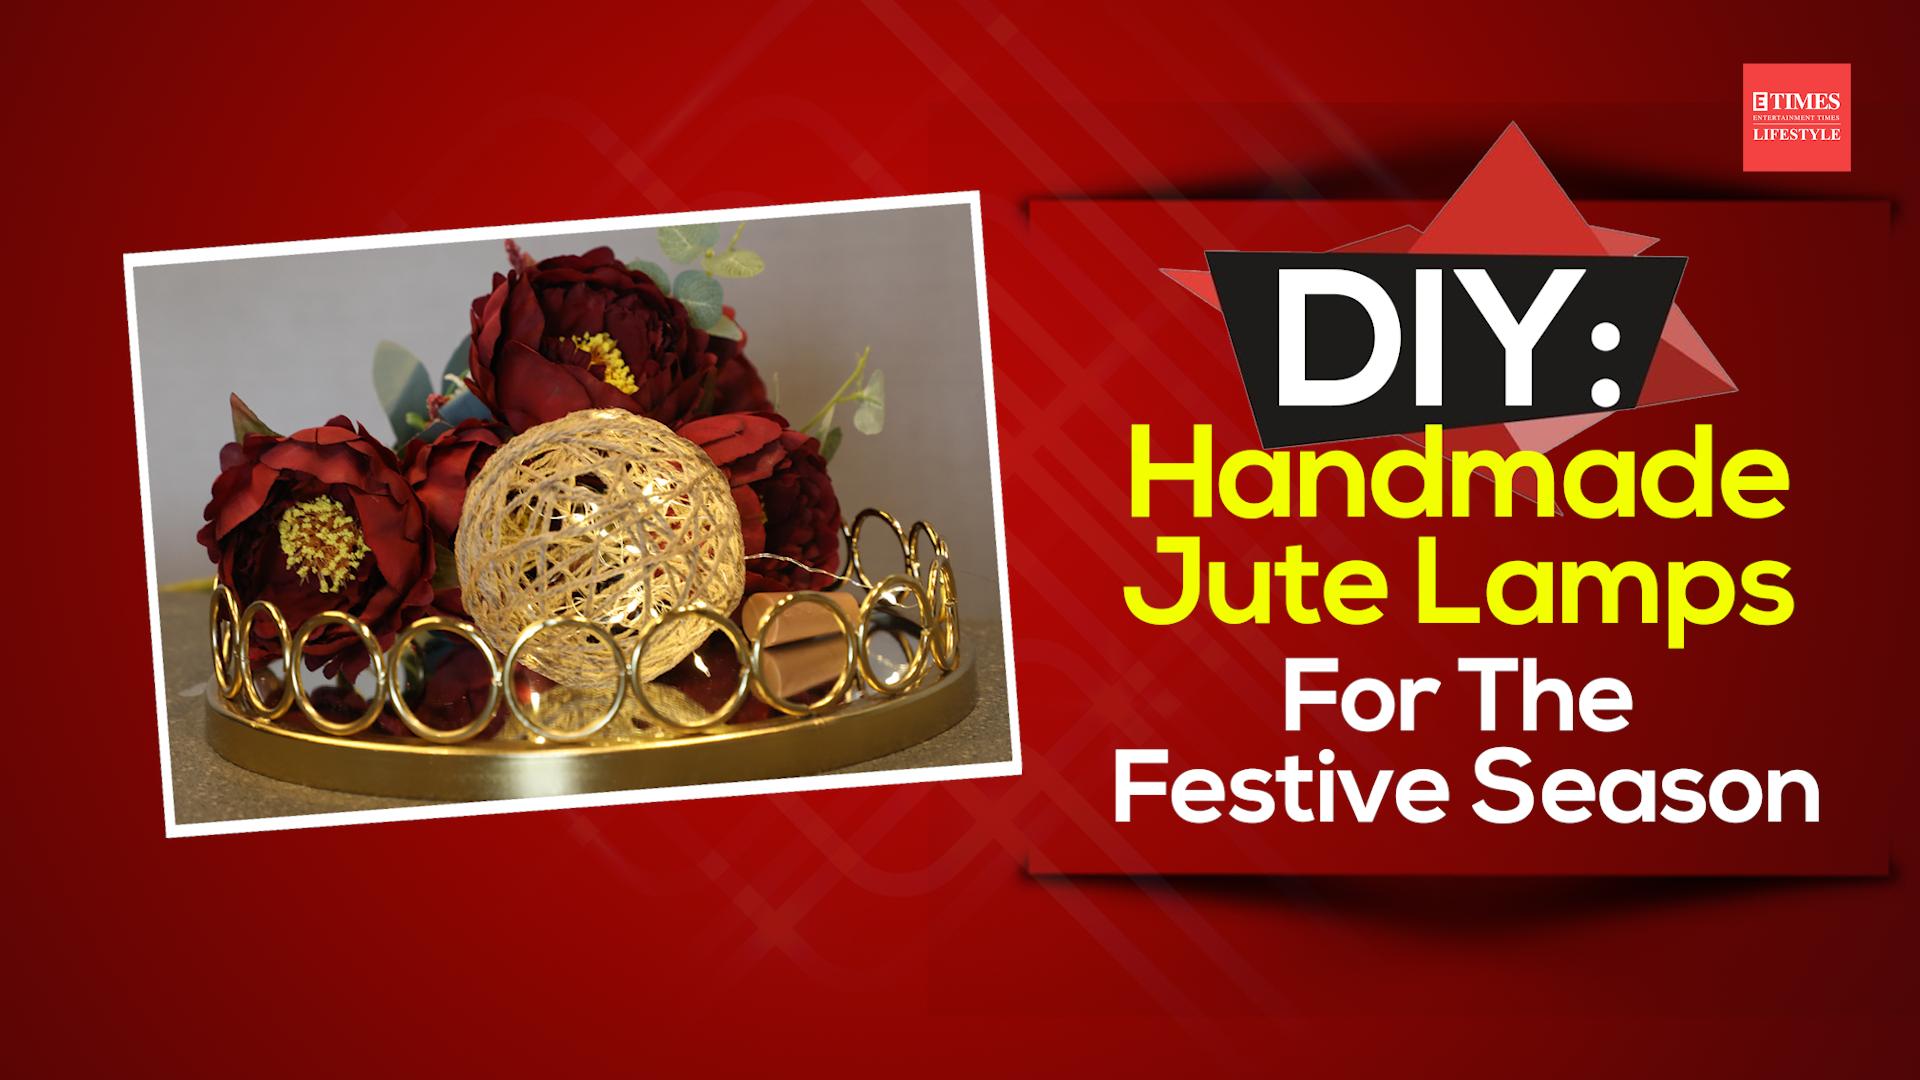 diy-handmade-jute-lamps-for-the-festive-season